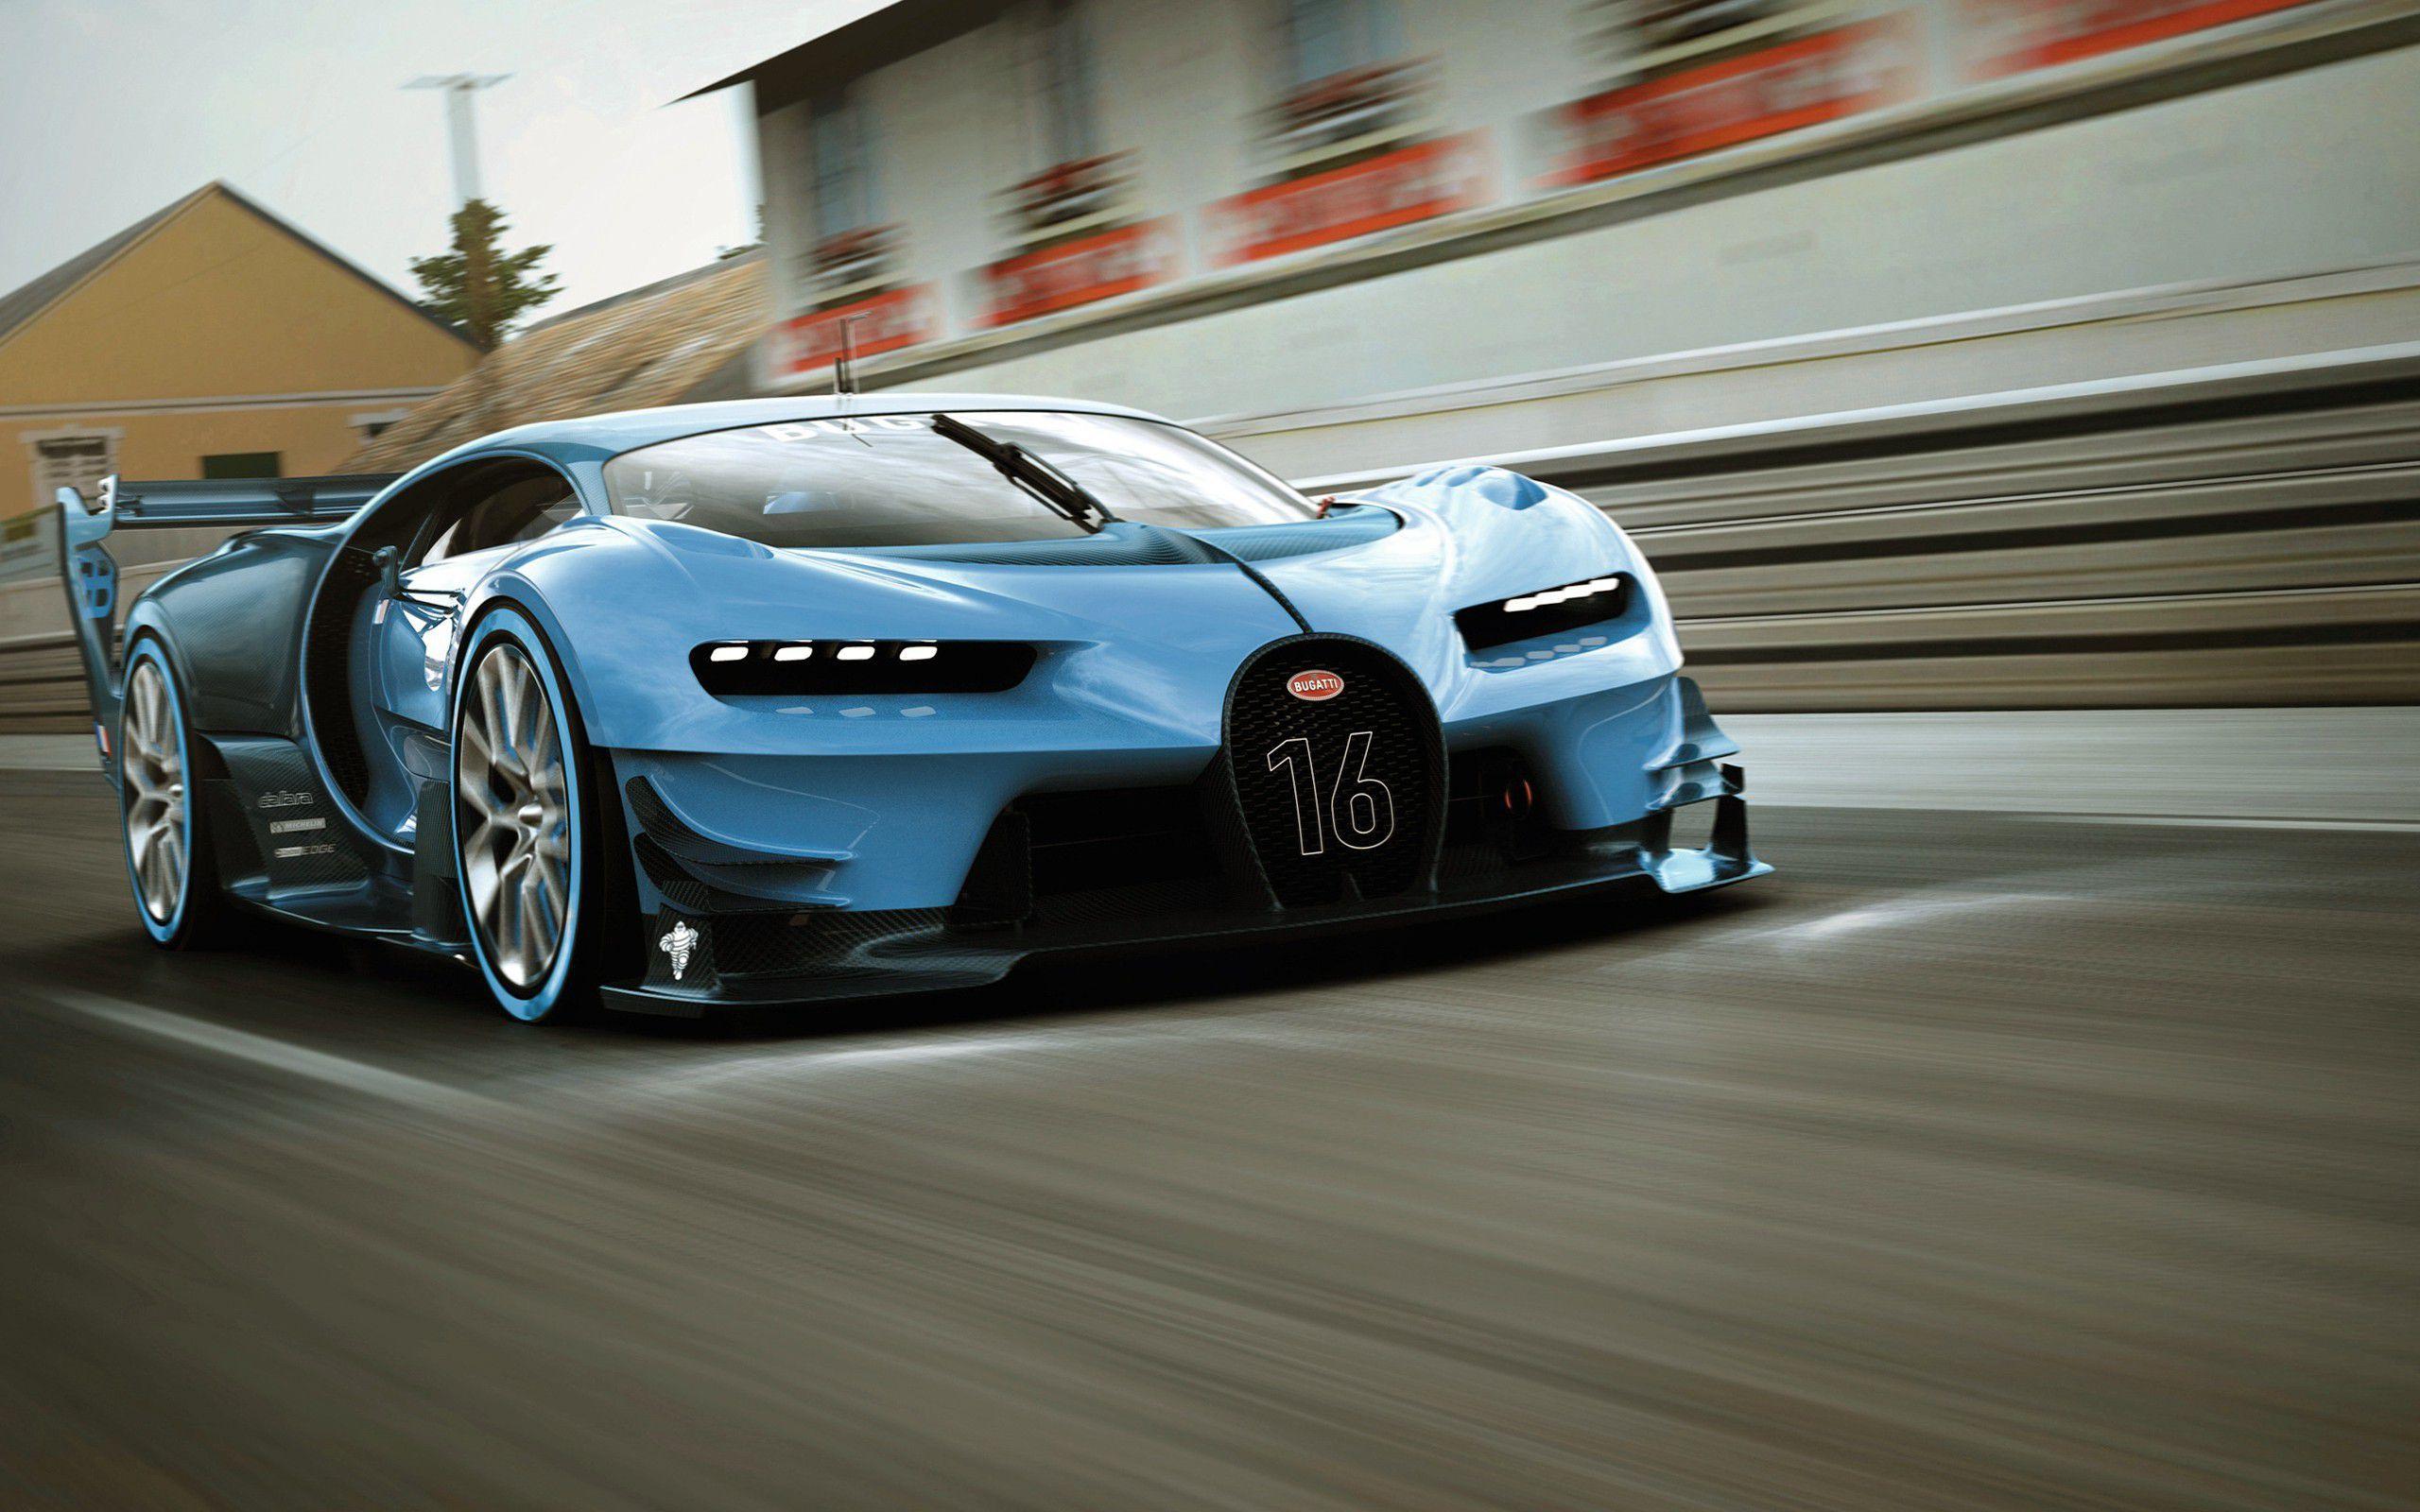 4k Ultra Hd Top Ten Cars Wallpapers - 4k Ultra Hd Car ...